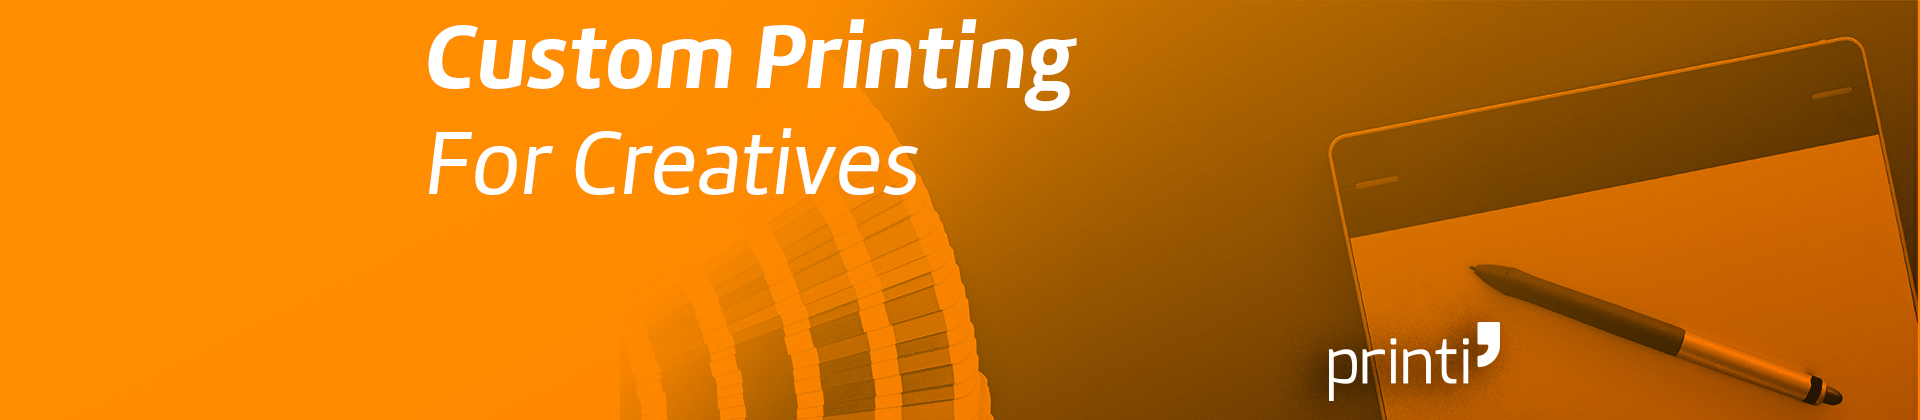 Custom Printing for Creatives